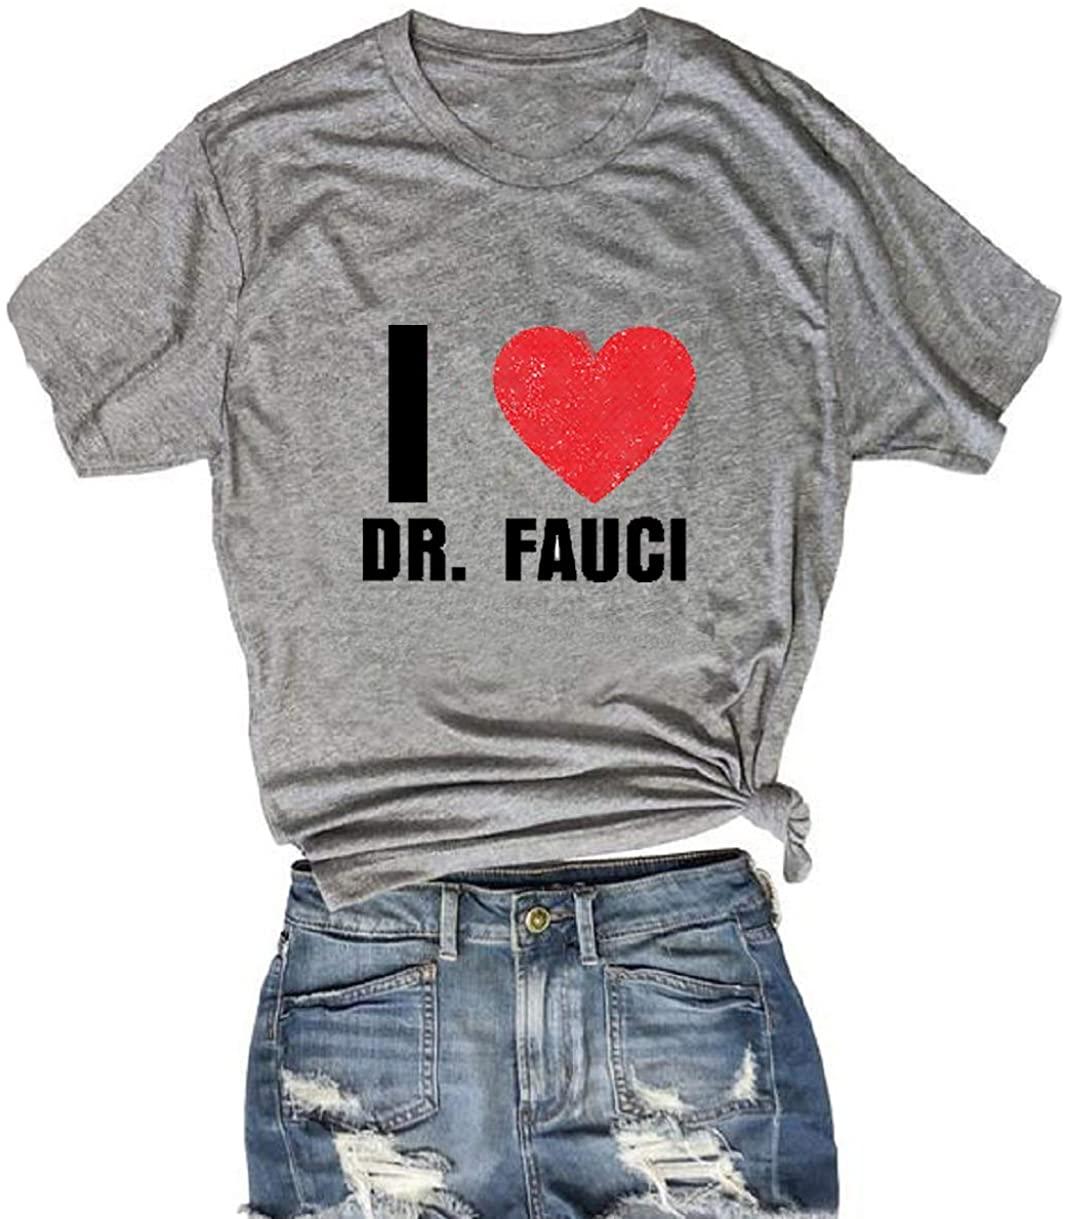 I Love Dr Fauci T Shirts for Women Heart Print Short Sleeve Tops Summer Blouse